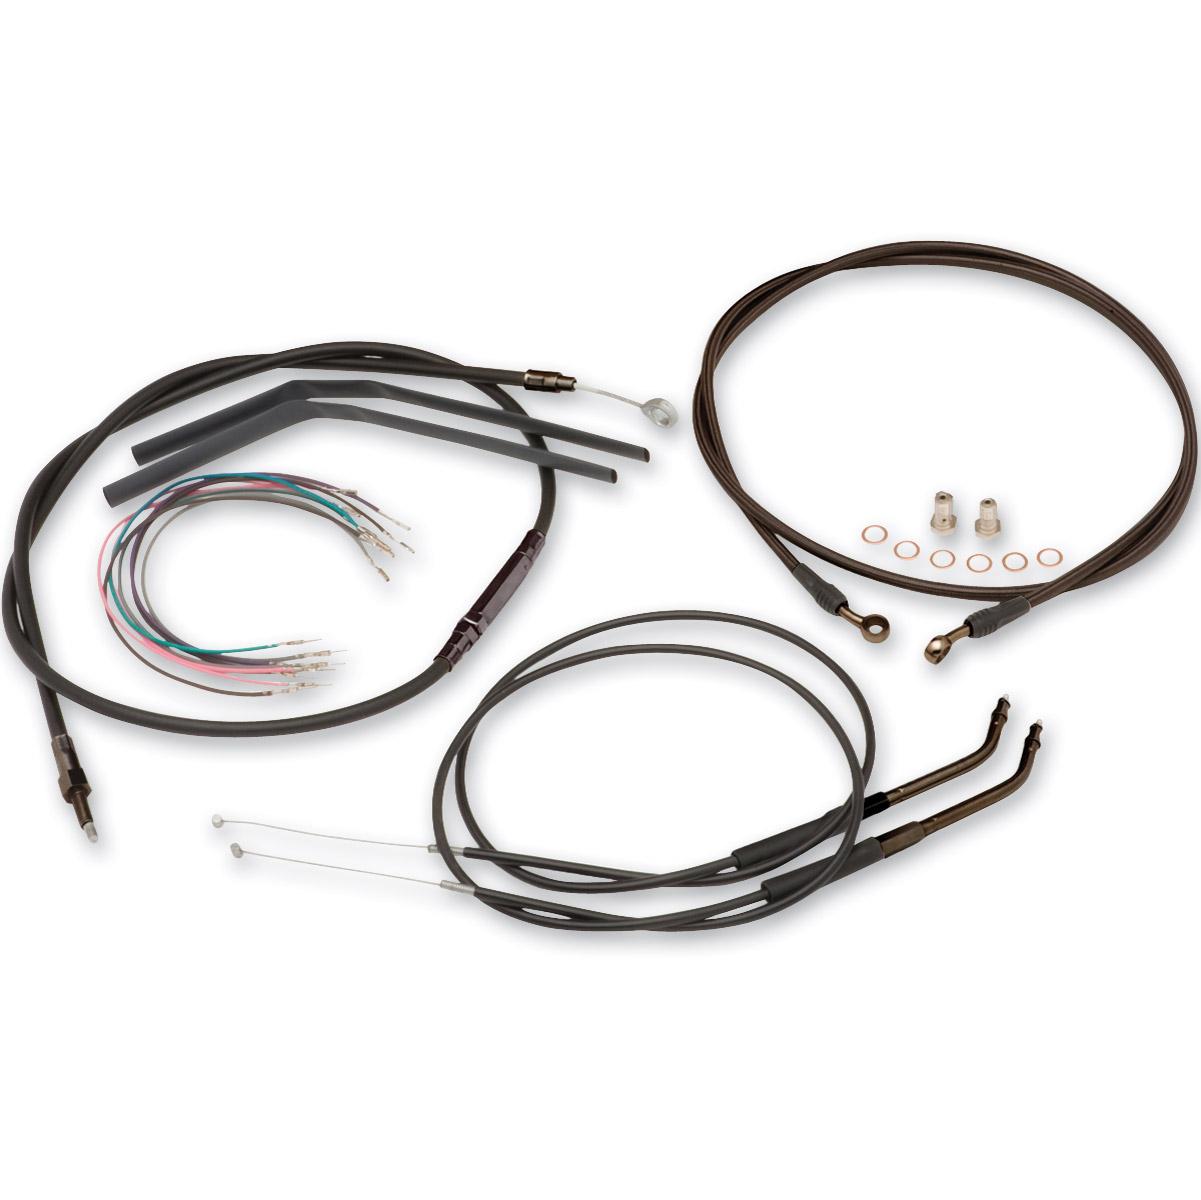 burly brand black 16 u2033 ape hanger cable  brake kit